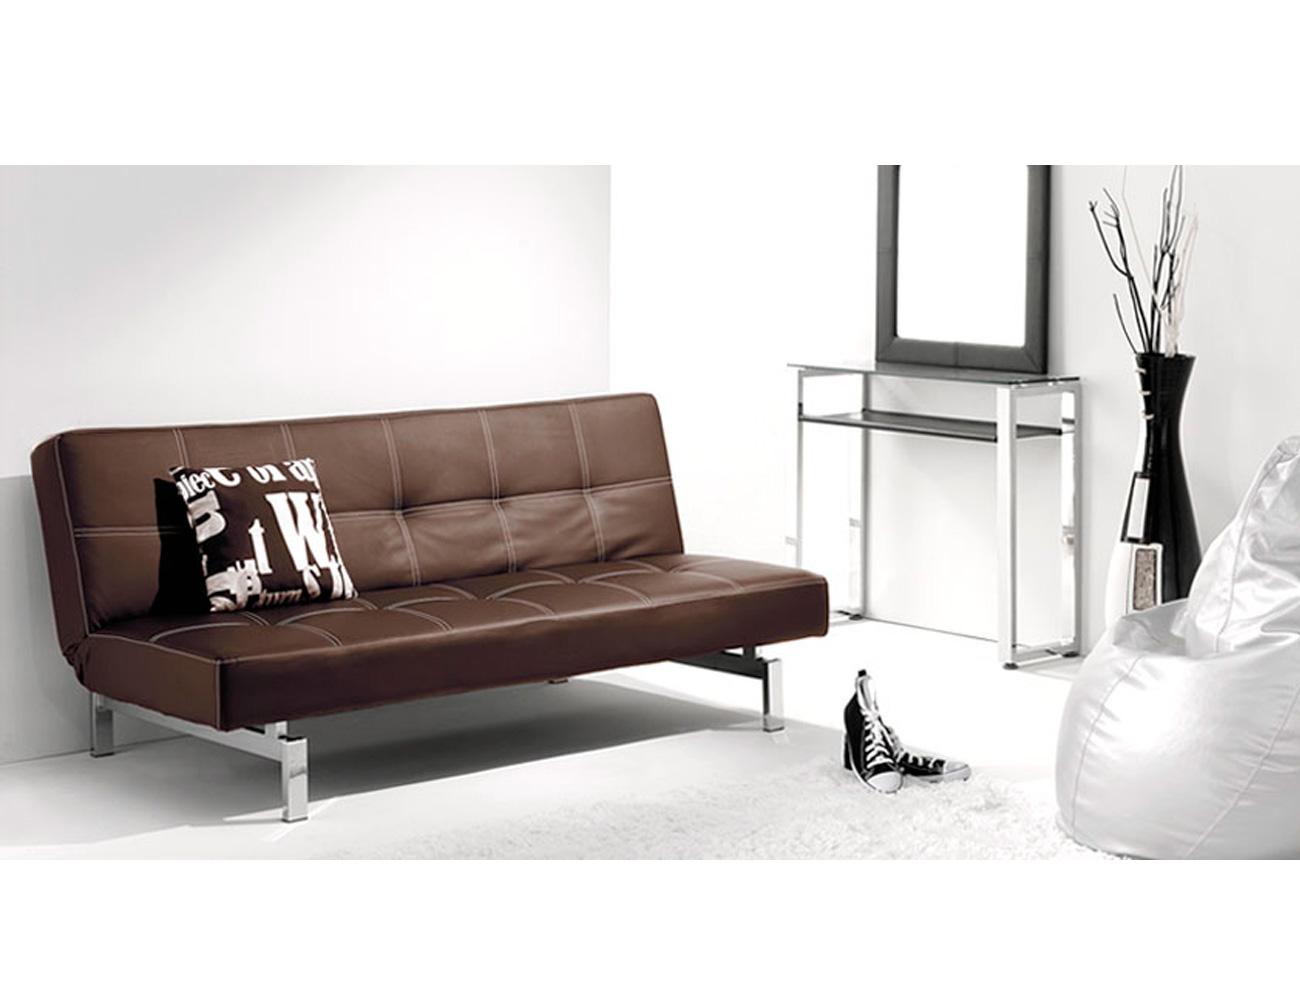 Sofa cama click clak chocolate